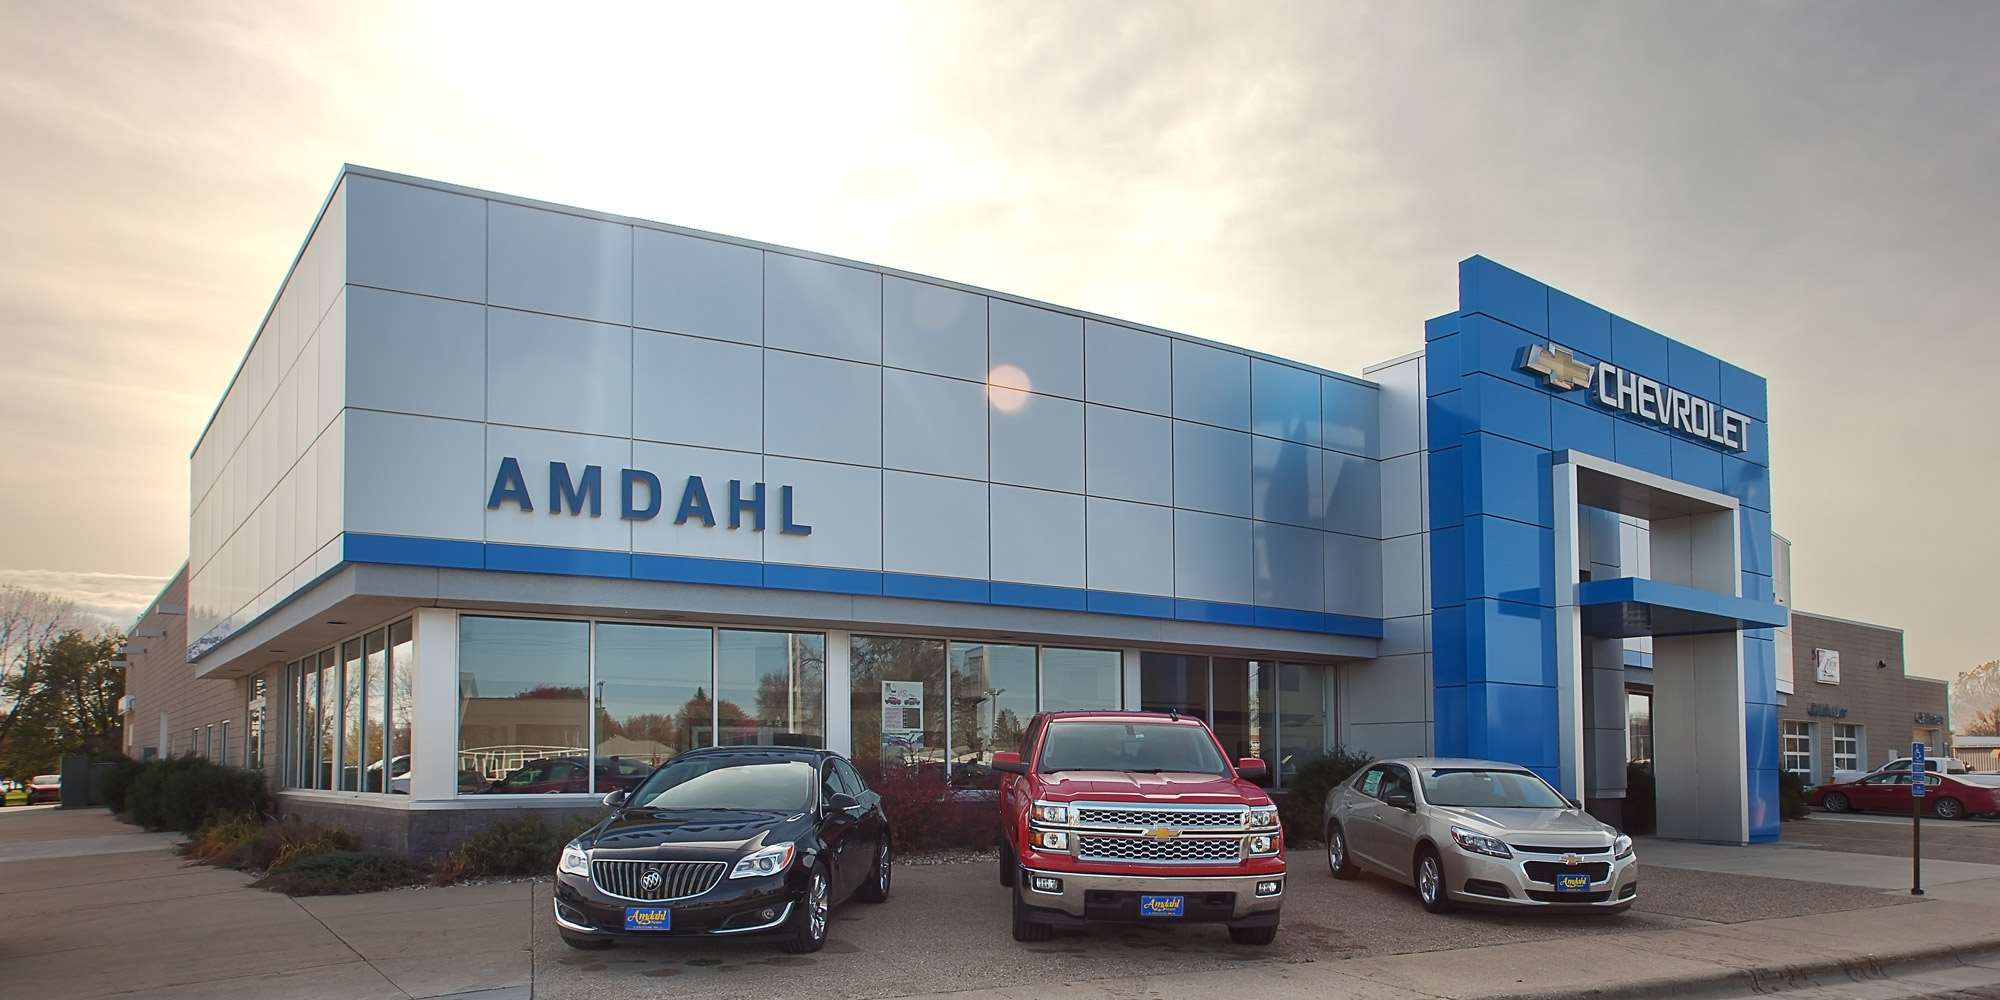 Amdahl Motors Chevy >> Amdahl Chevy Buick GMC | Pipestone MN | Amdahl Motors